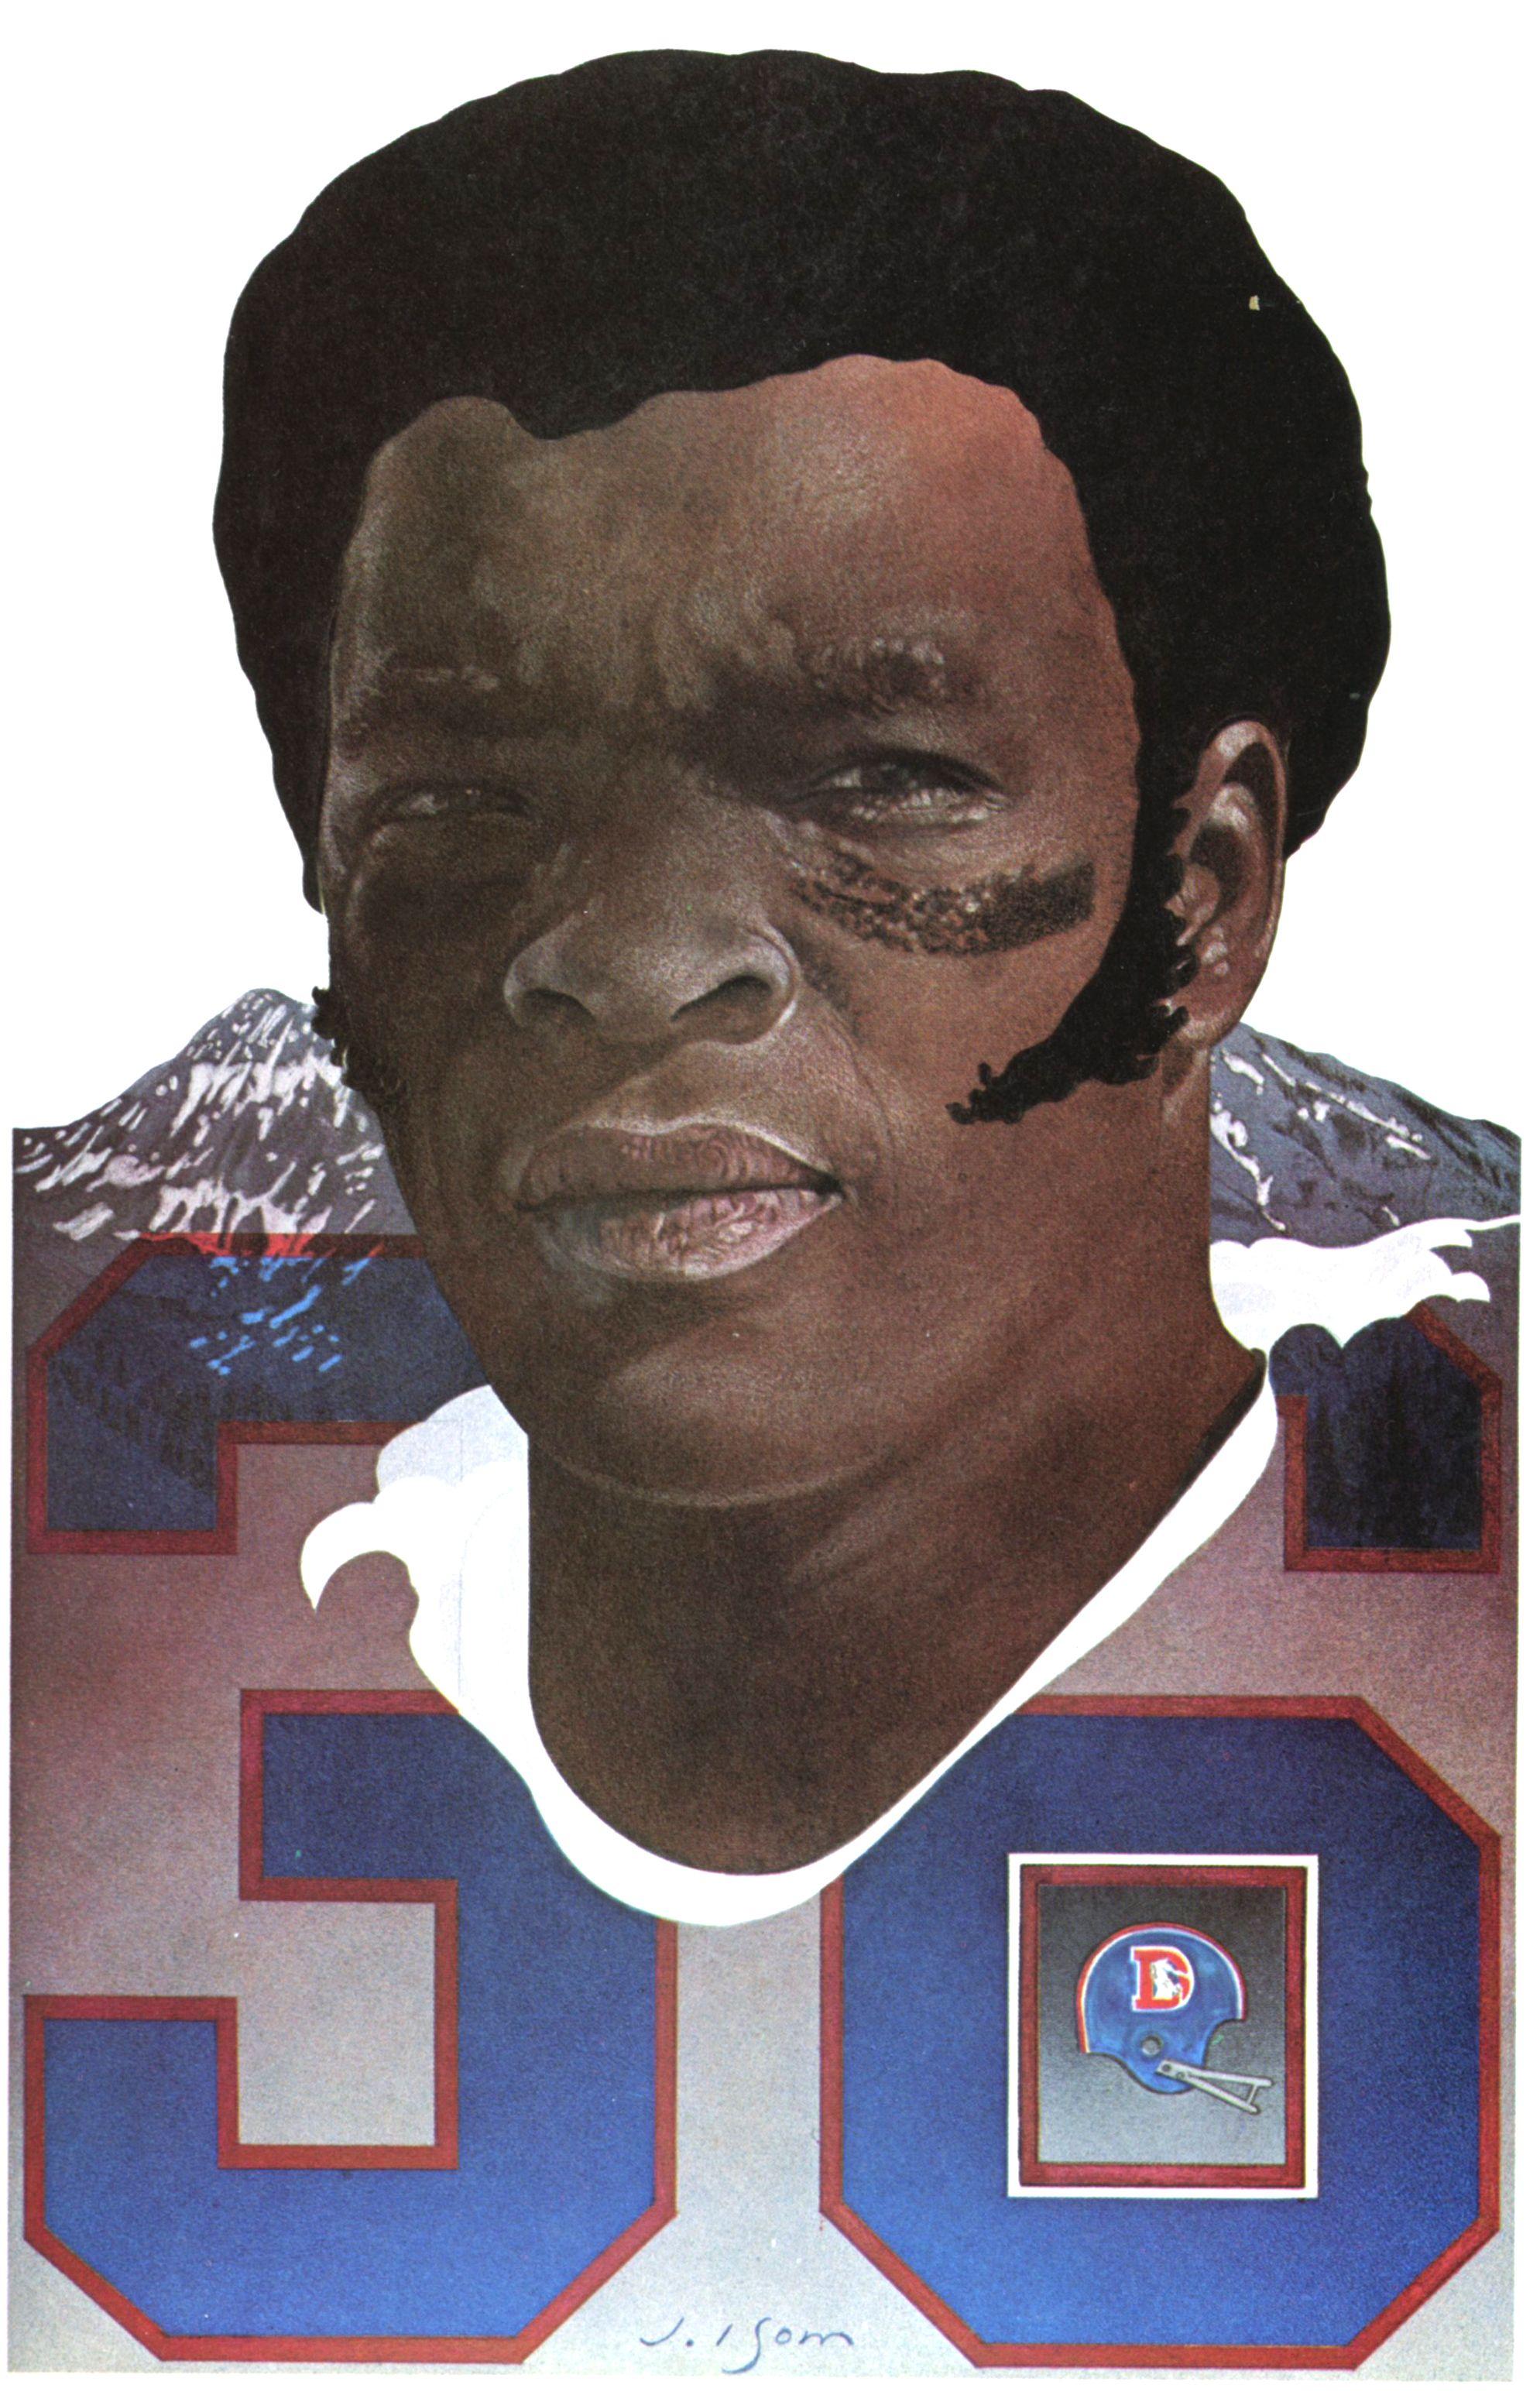 Bill Thompson, Denver Broncos Safety. Portrait by Joe Isom 1978.